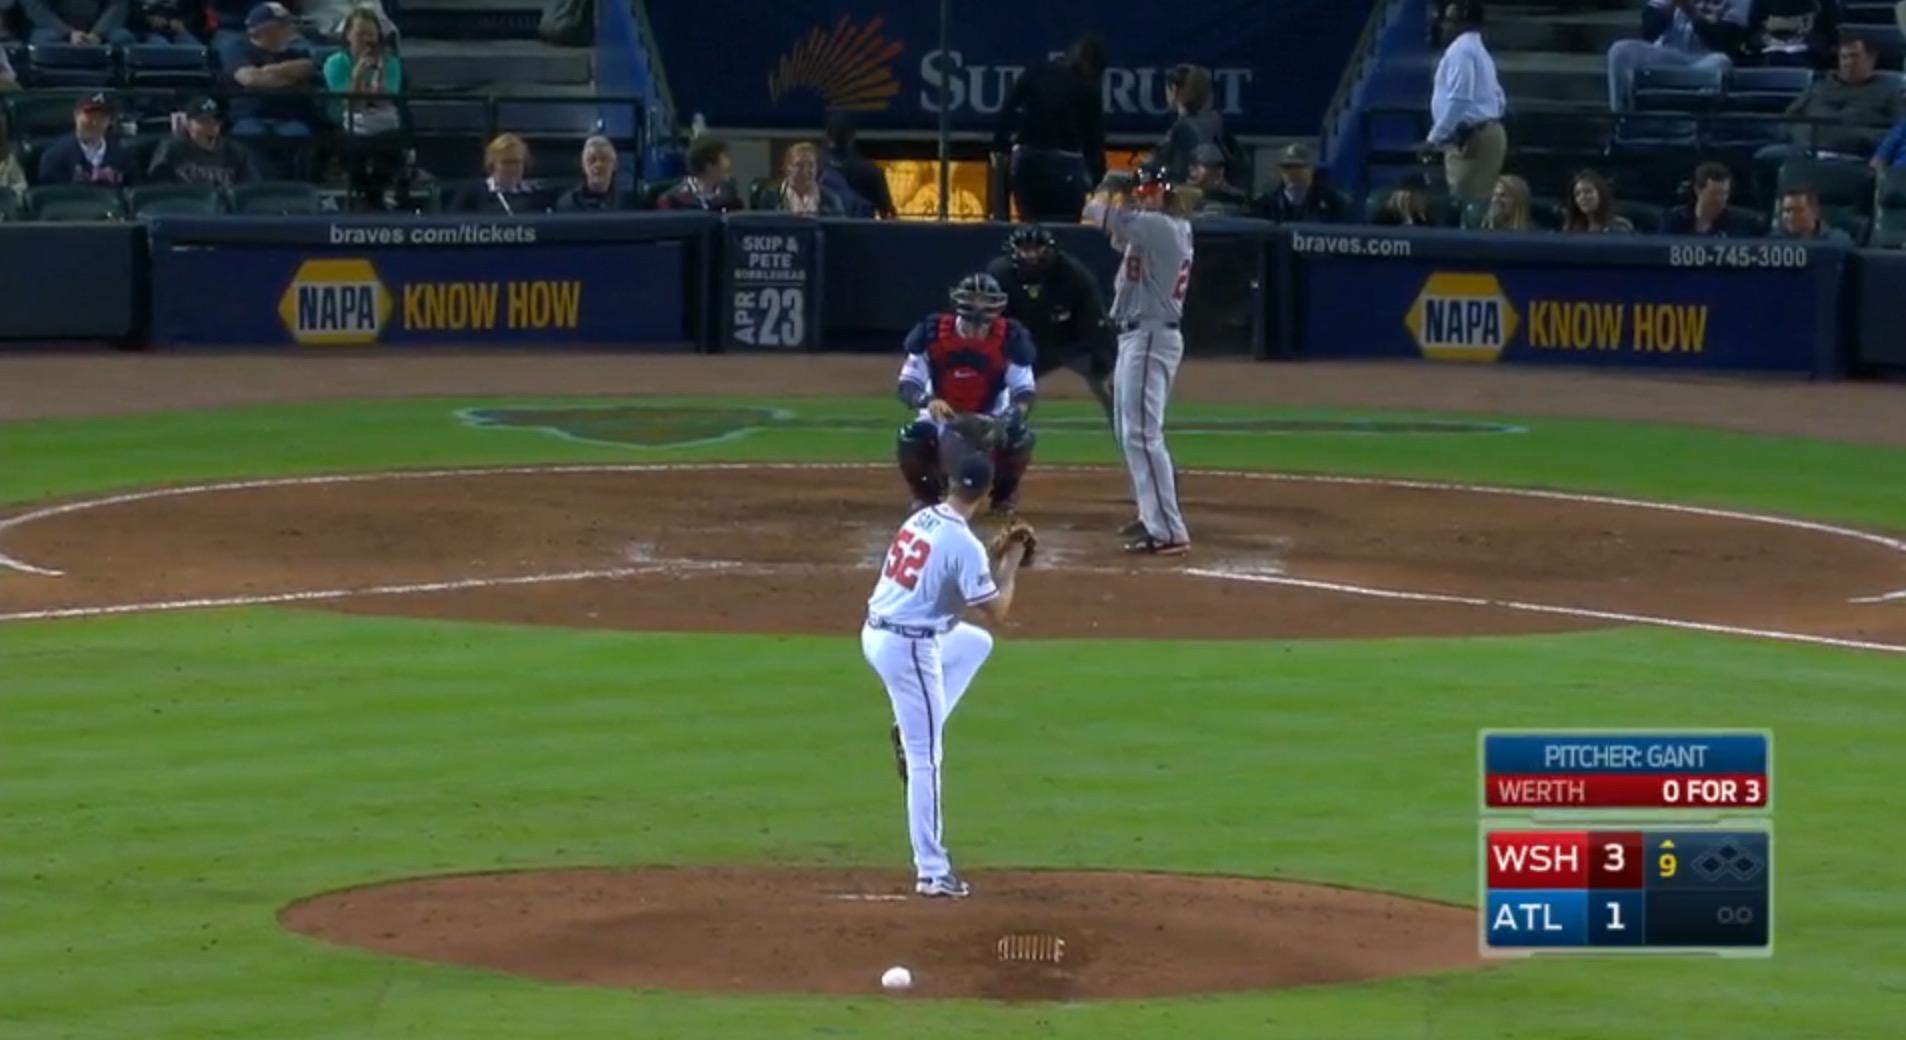 Strange wind up from Braves pitcher John Gant